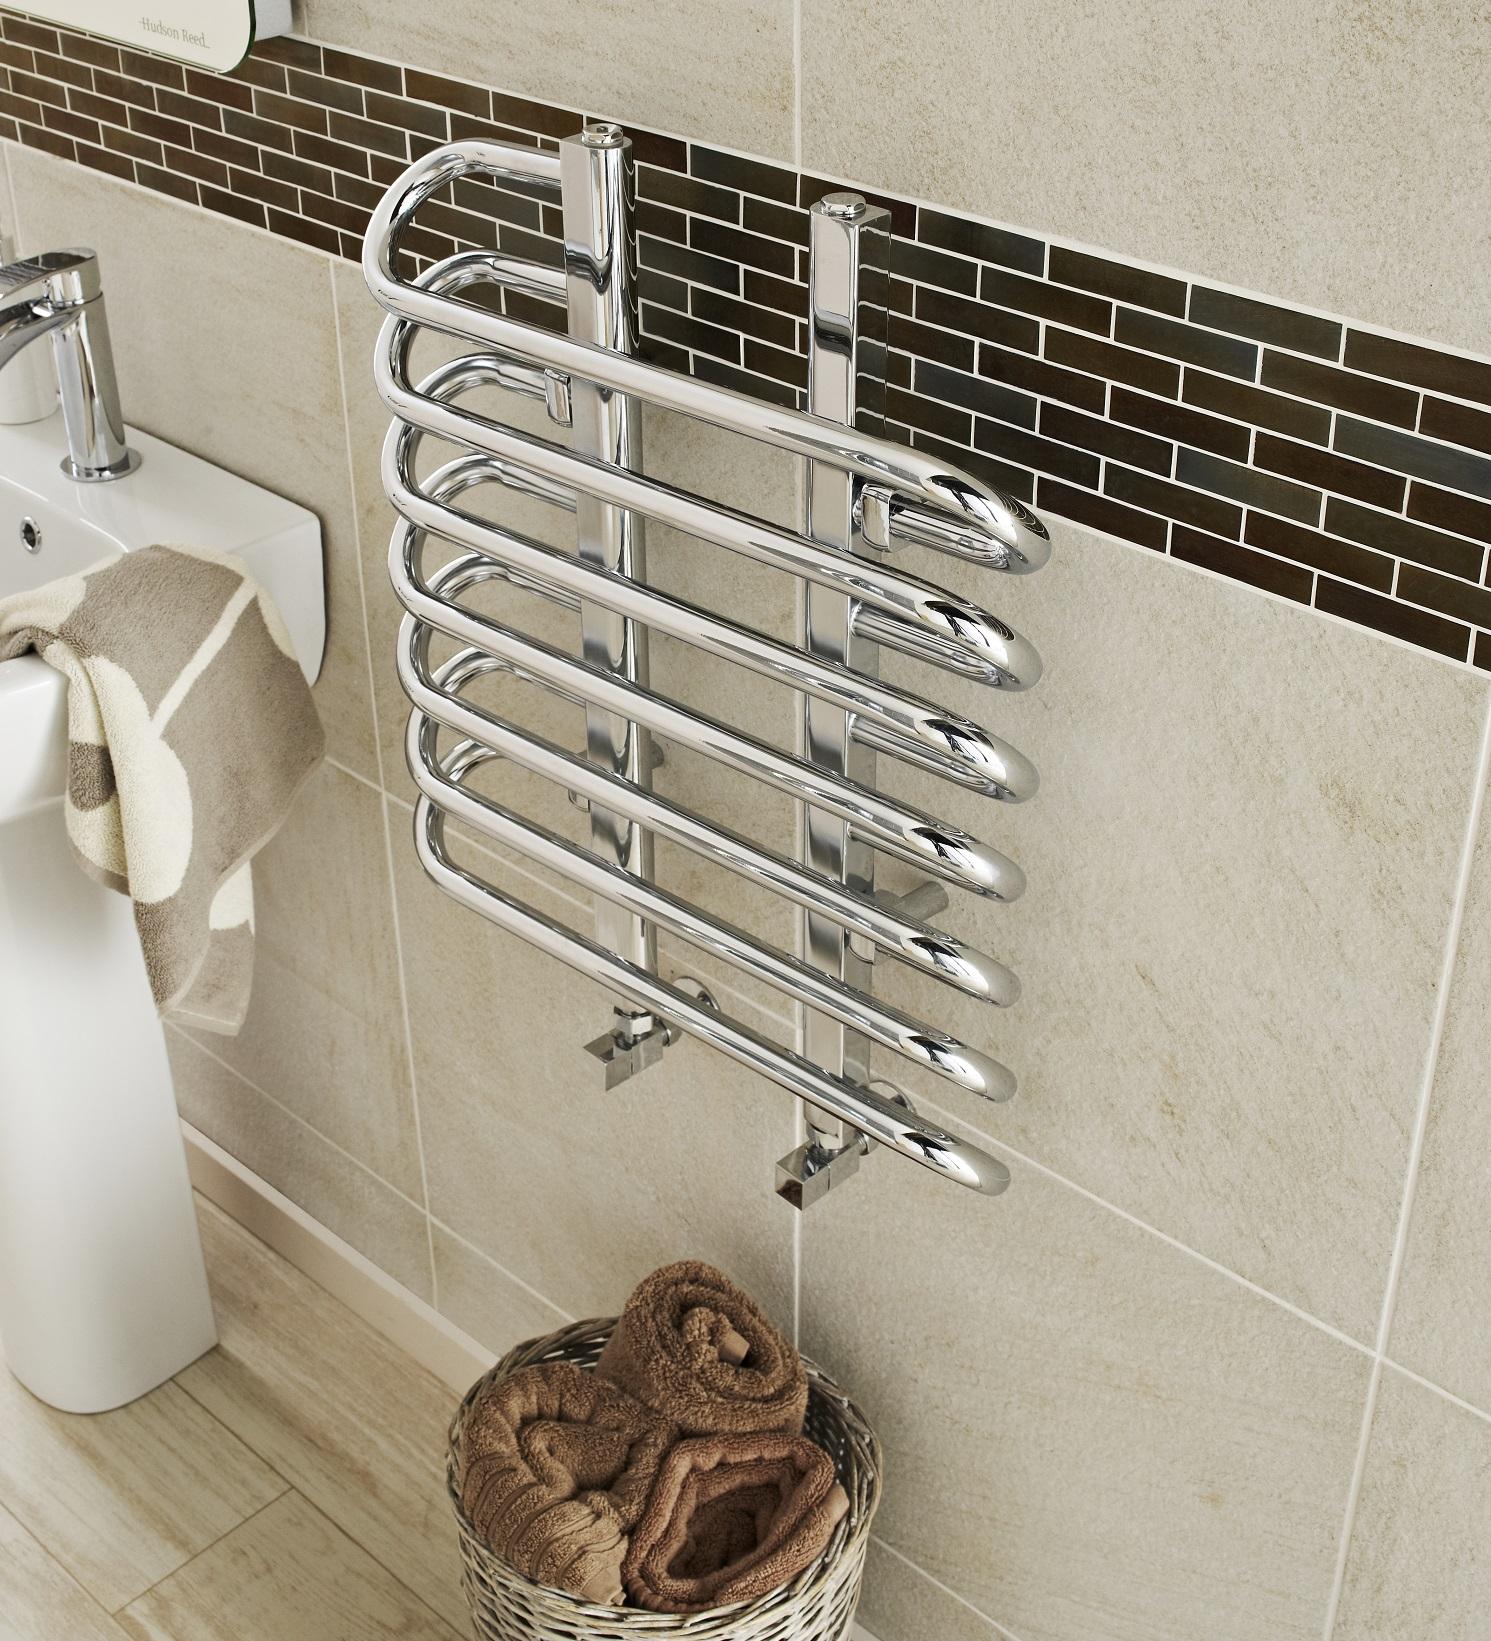 Bathroom heated towel radiators - Should I Choose A Plumbed Or Electric Bathroom Towel Rail